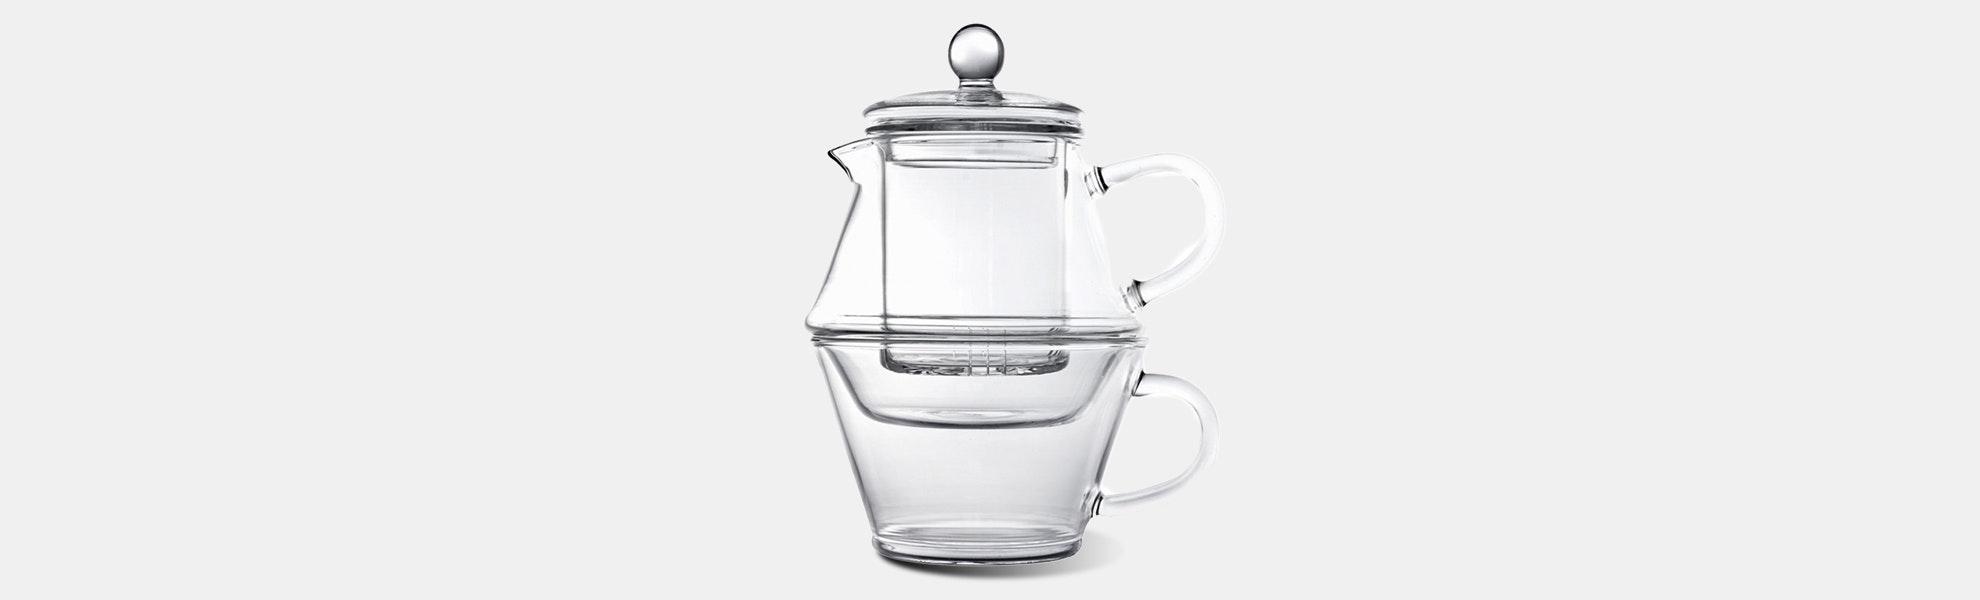 Bredemeijer 14-Ounce Borosilicate Teapot for One